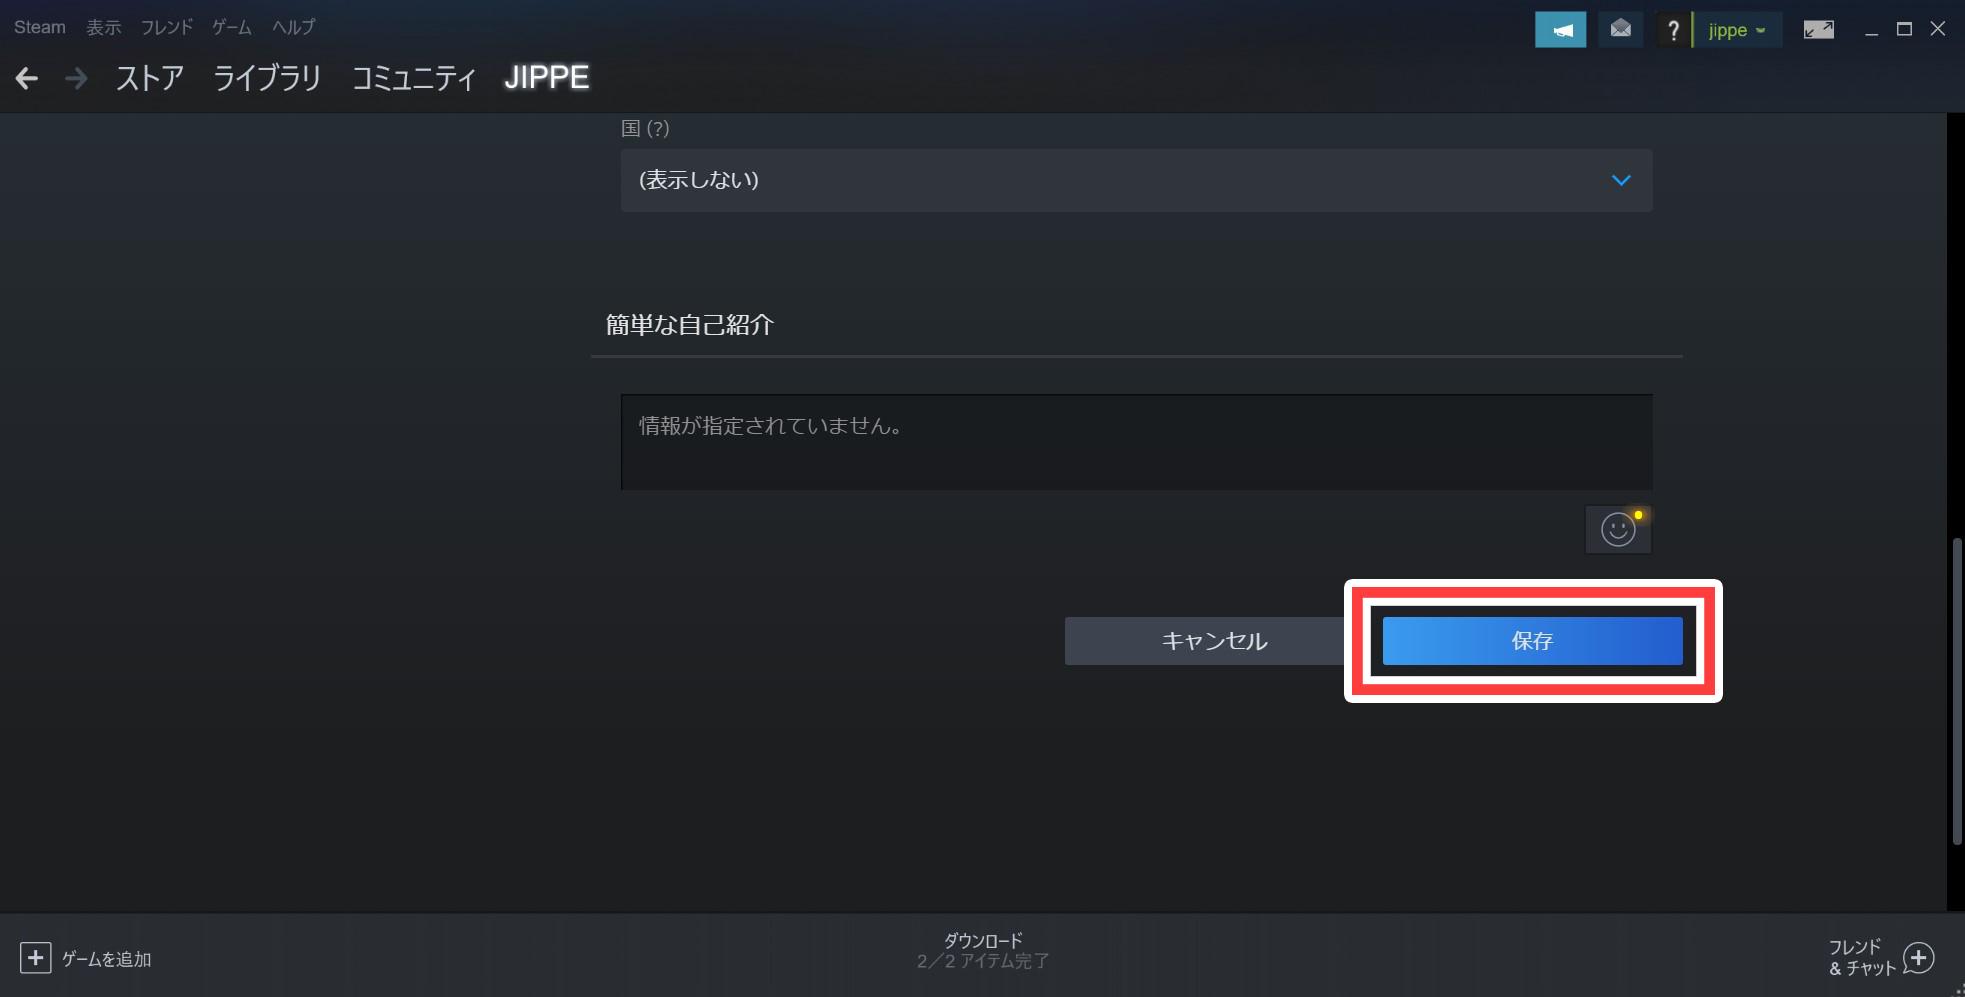 Steamのプロフィール設定を保存